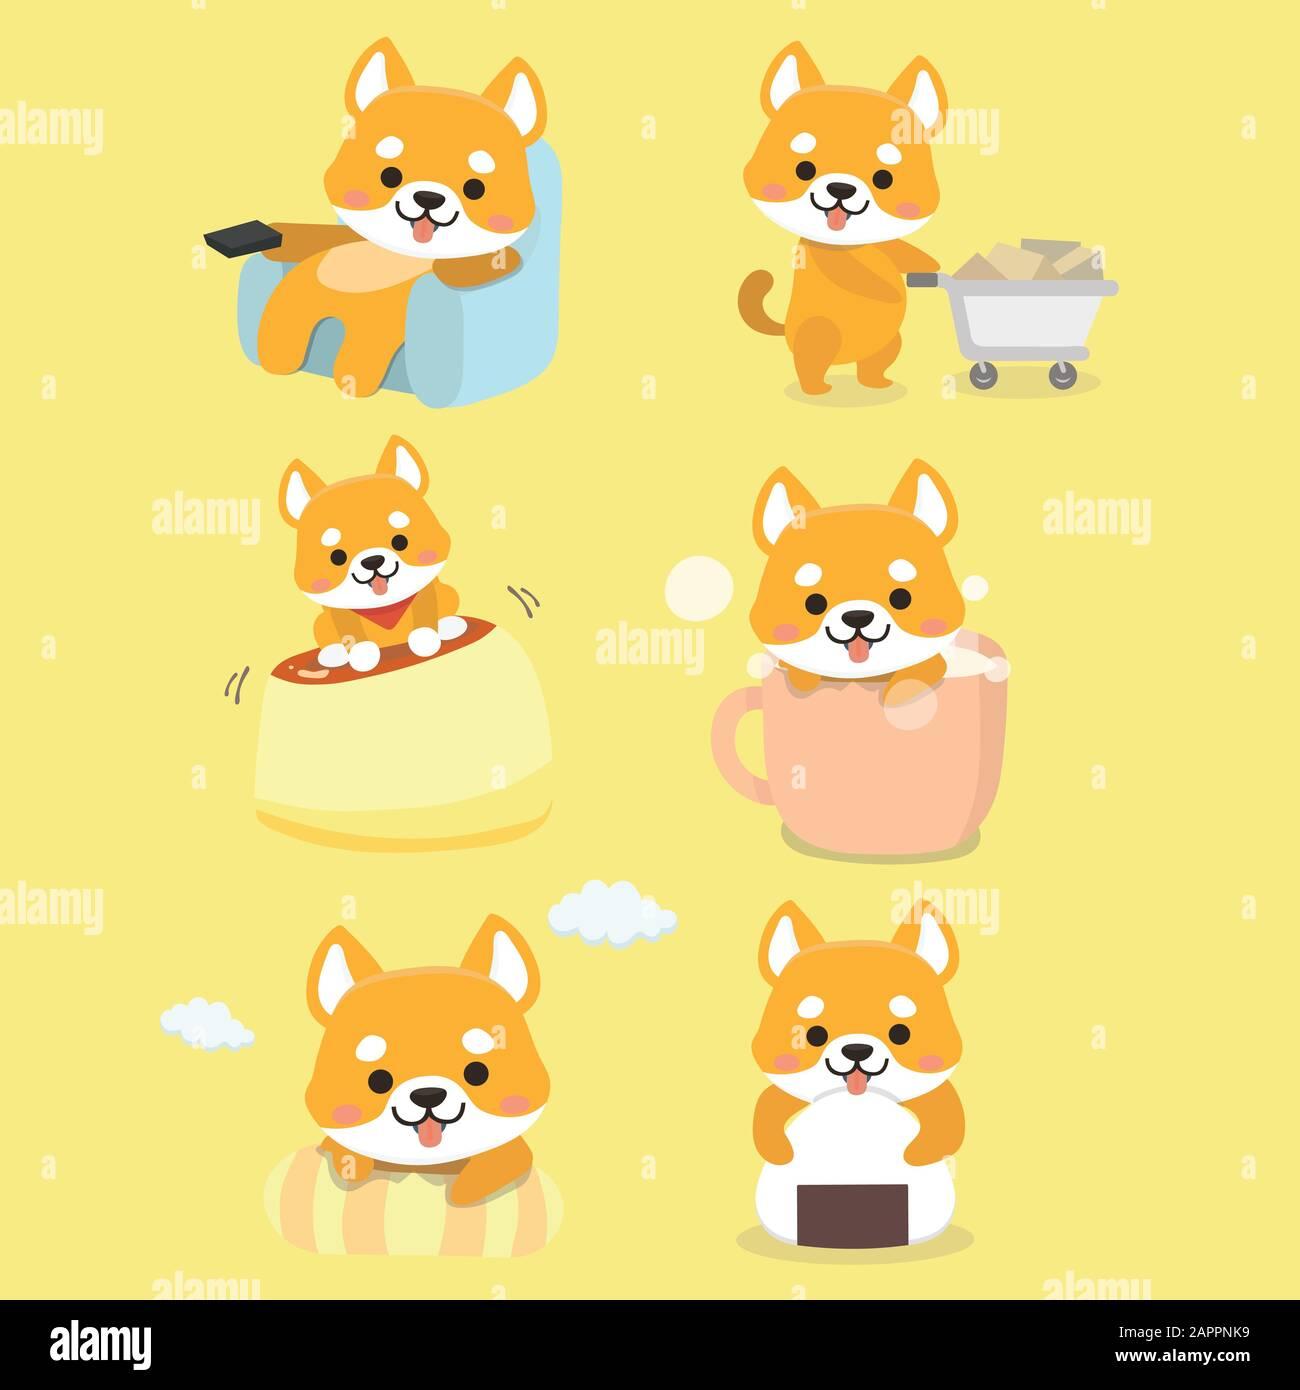 Shiba Inu Dog Cartoon Set Vector Stock Vector Image Art Alamy